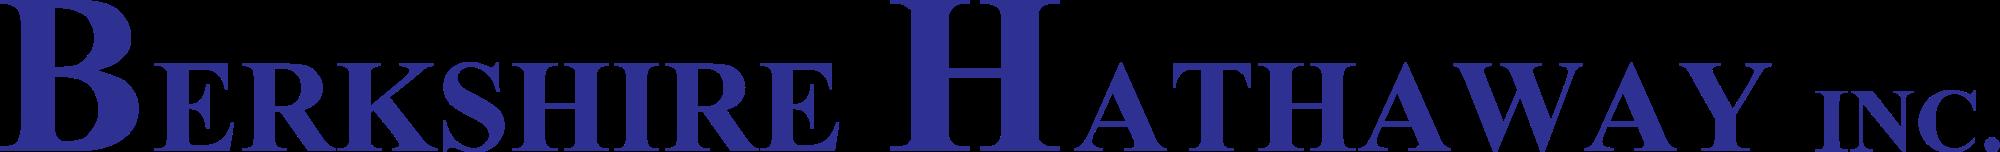 BRK-B logo